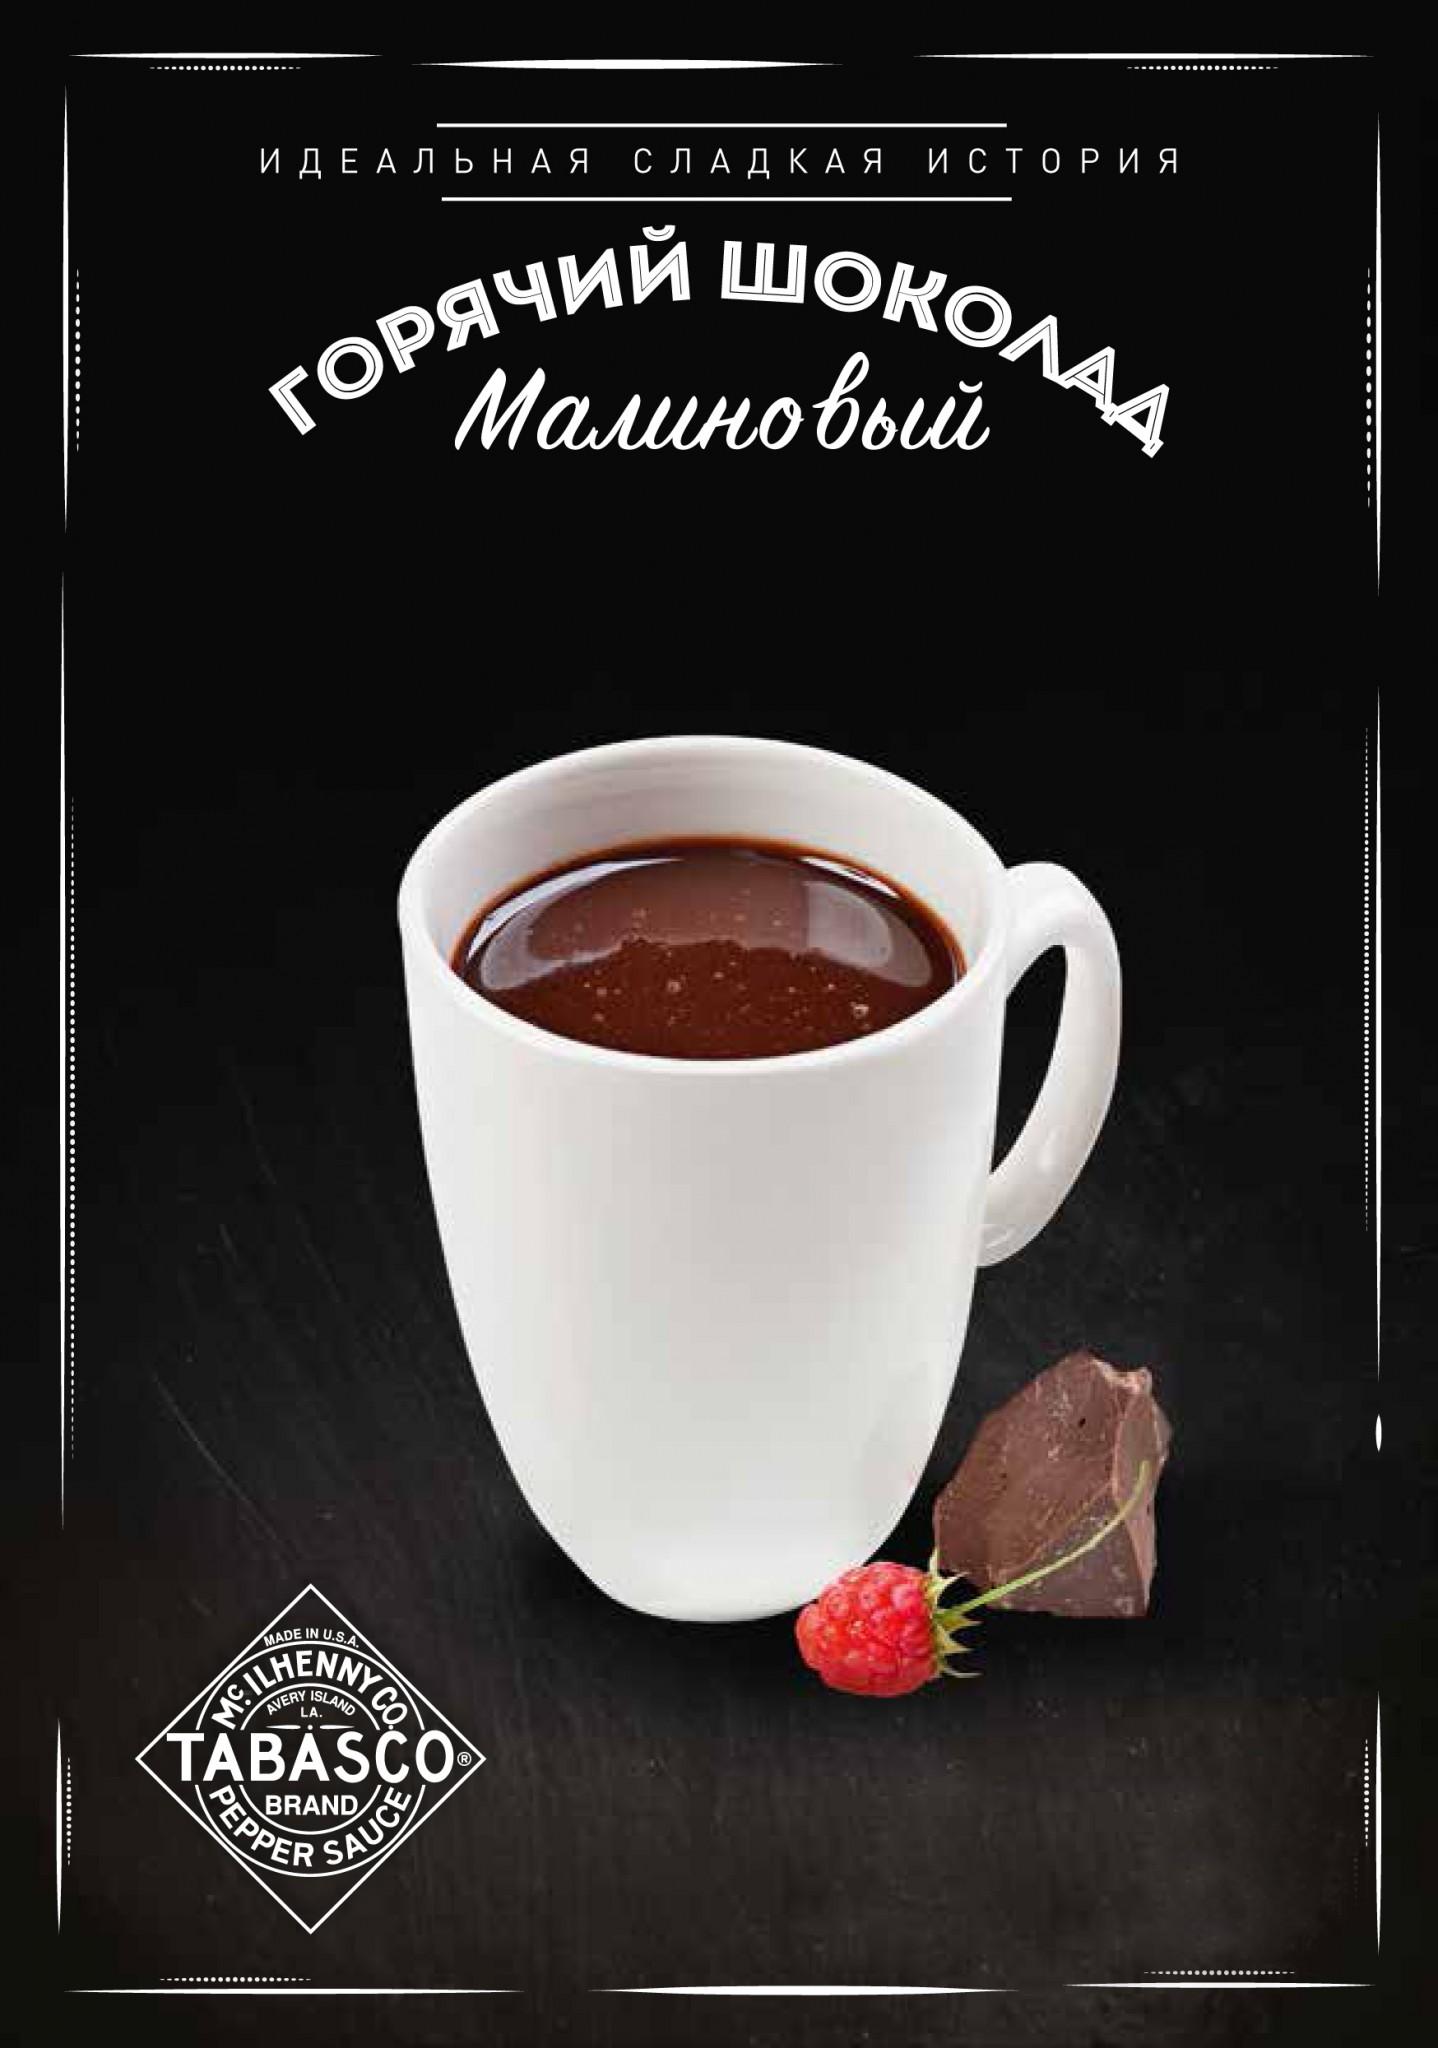 malinovyj-goryachij-shokolad